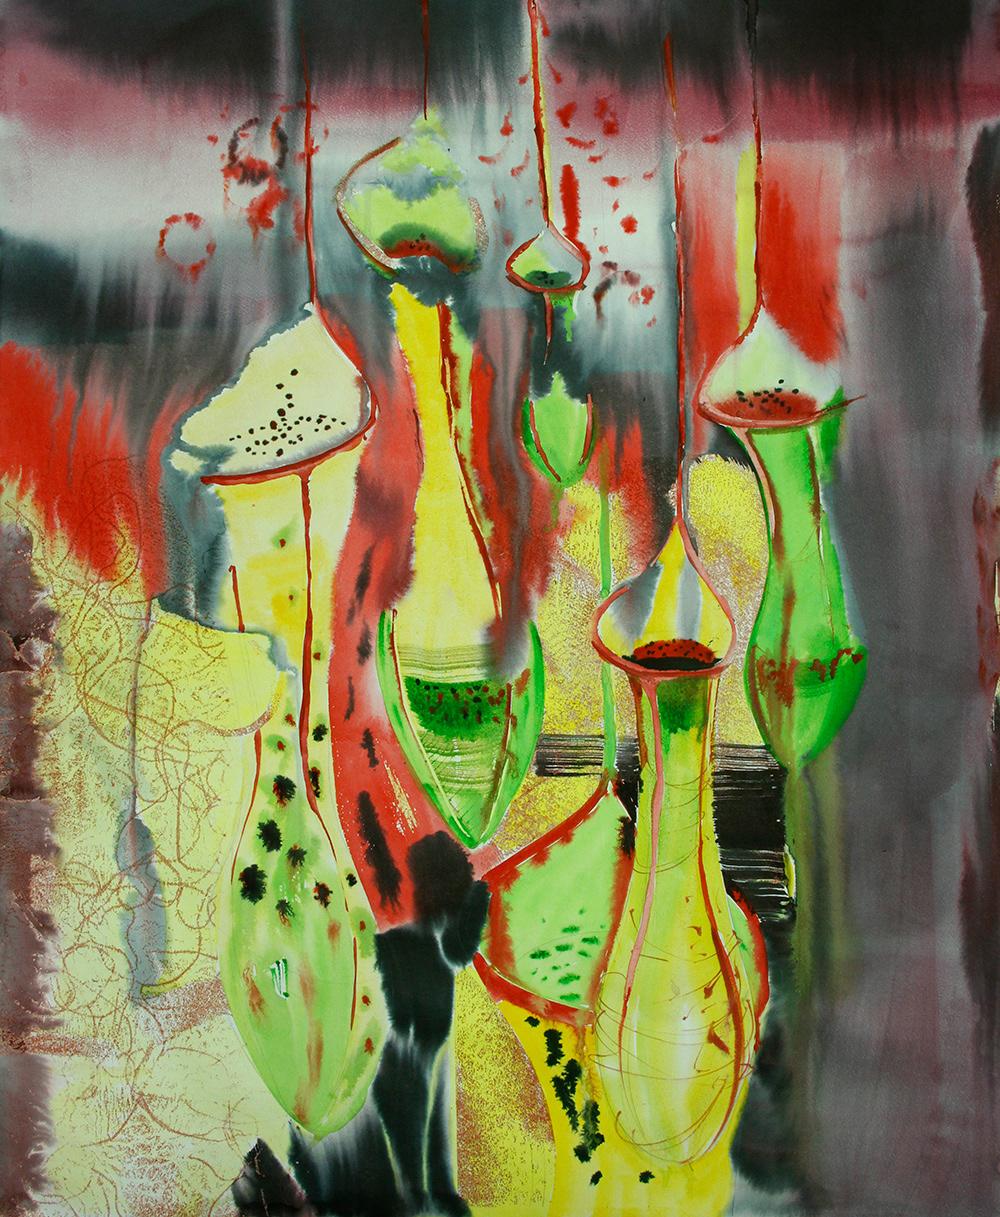 abstraction artist Flowers watercolor акварель астракция иллюстрация цветы